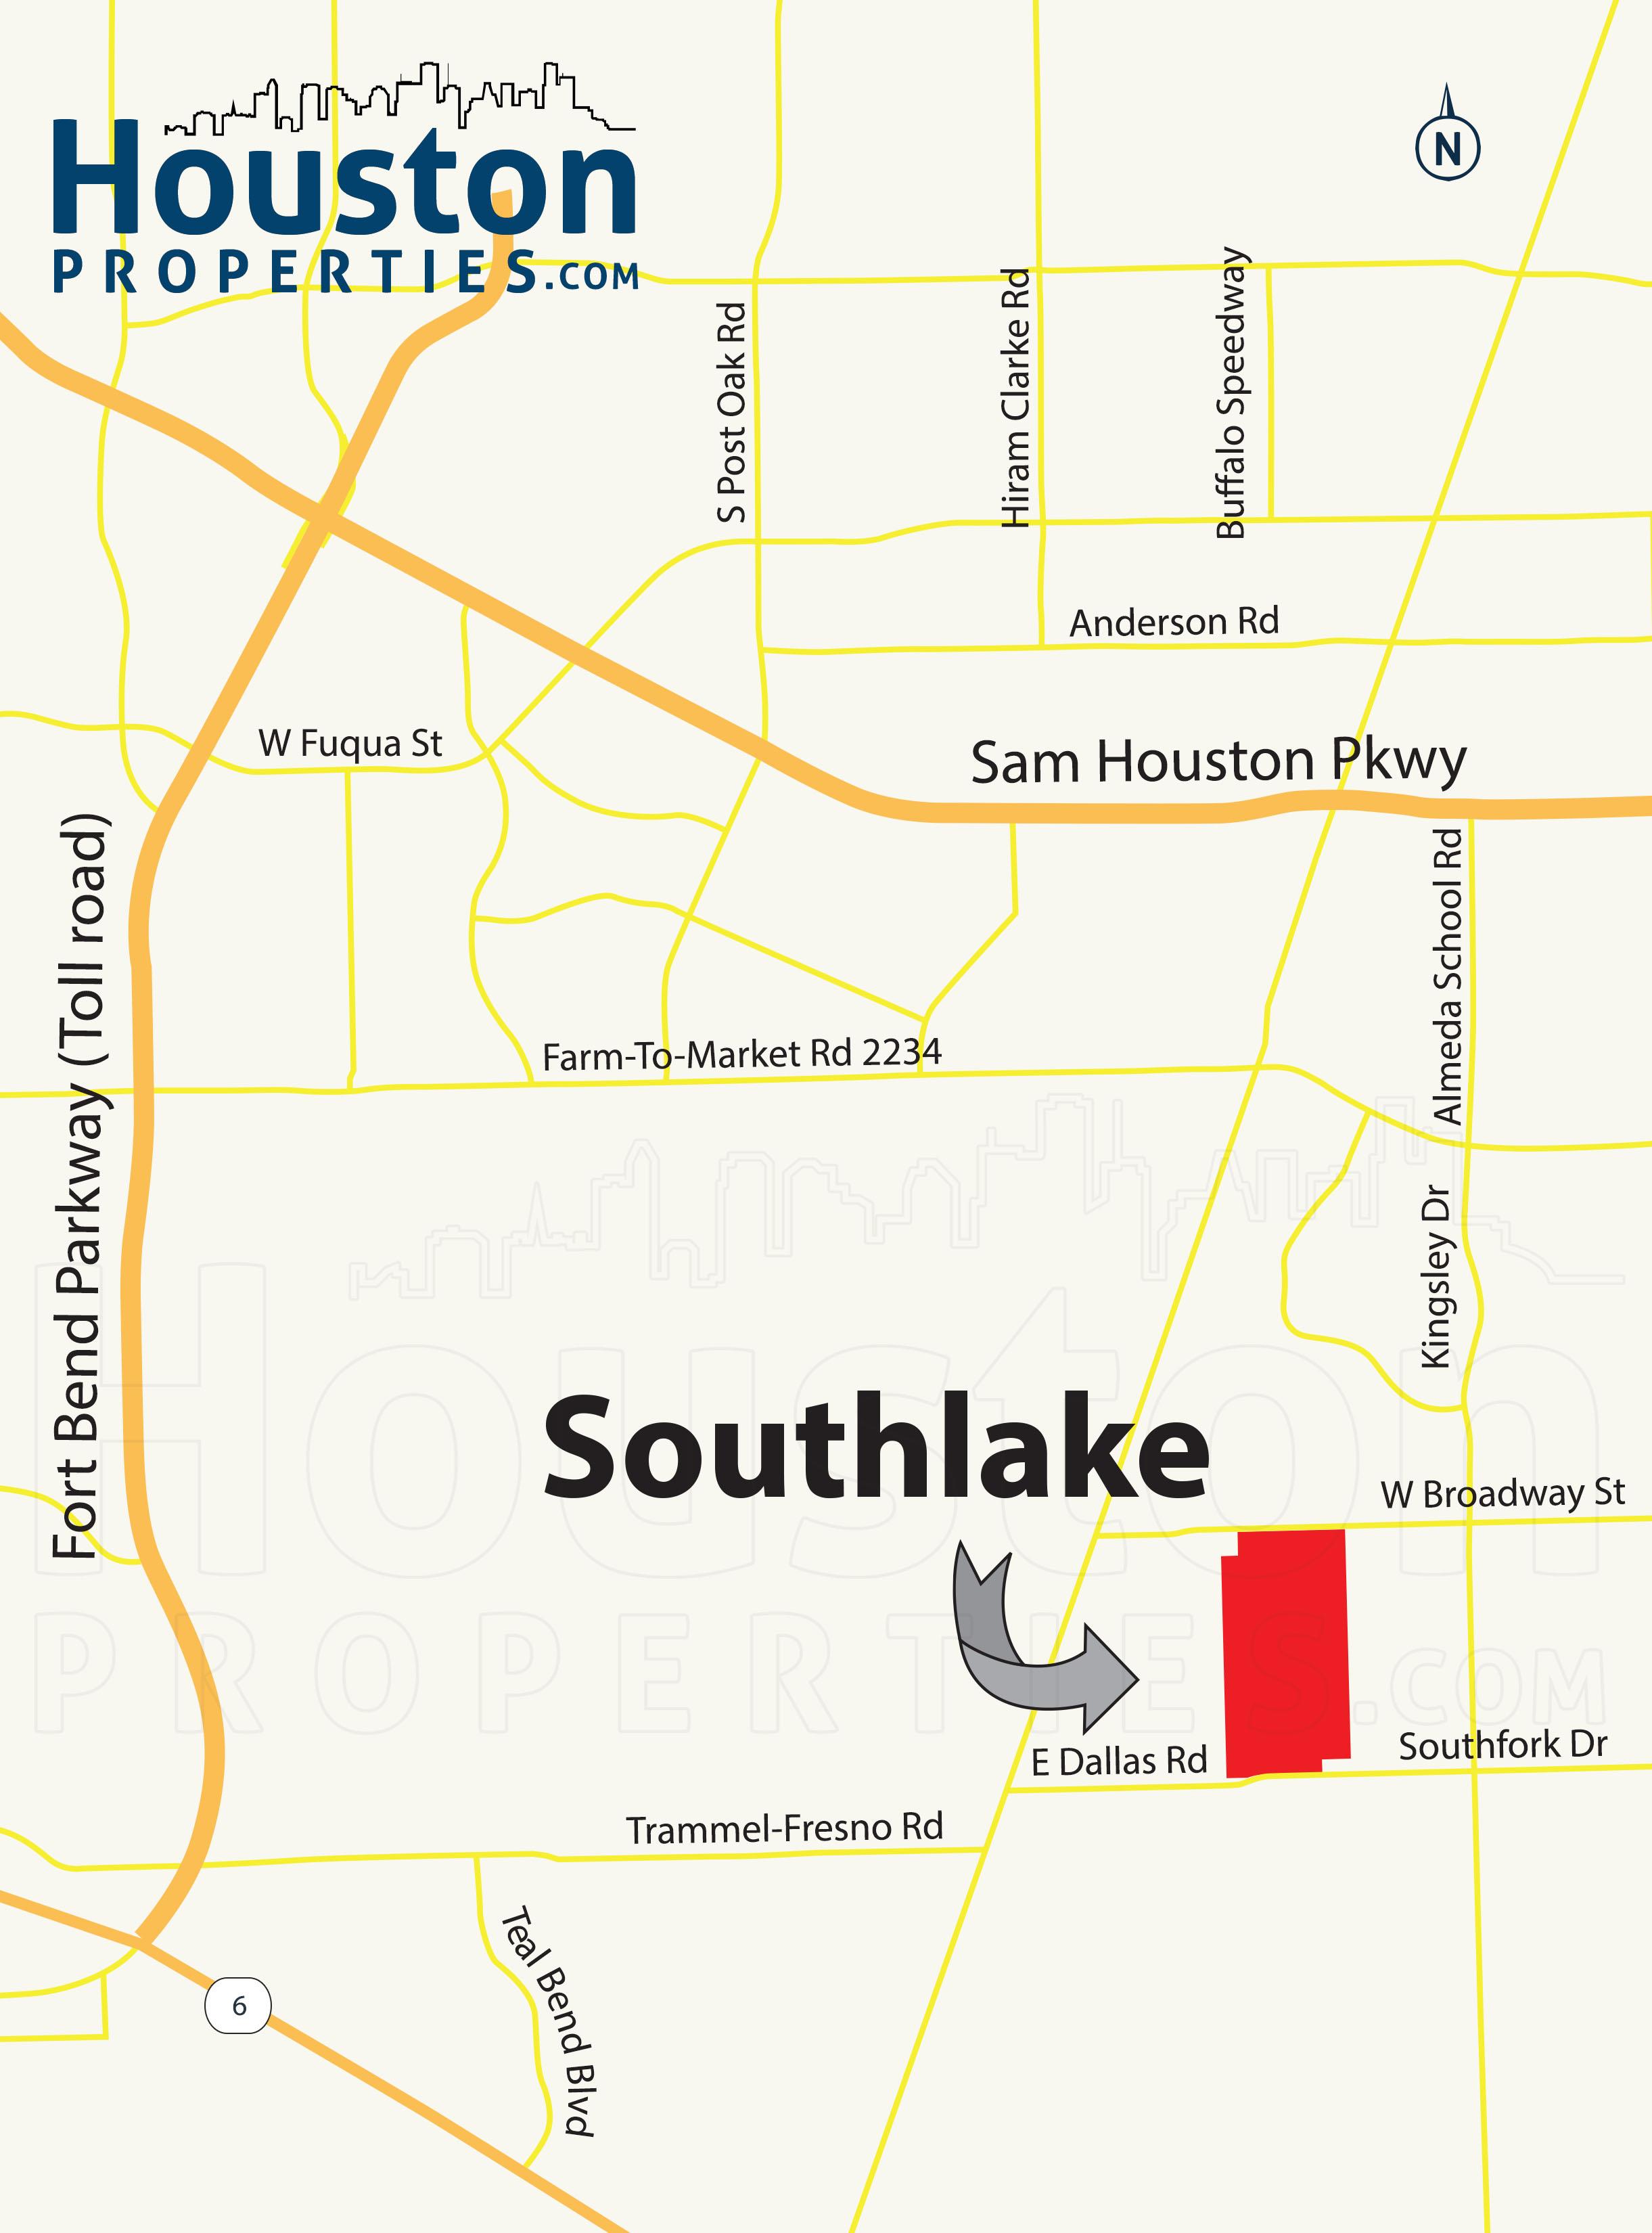 Southlake Location